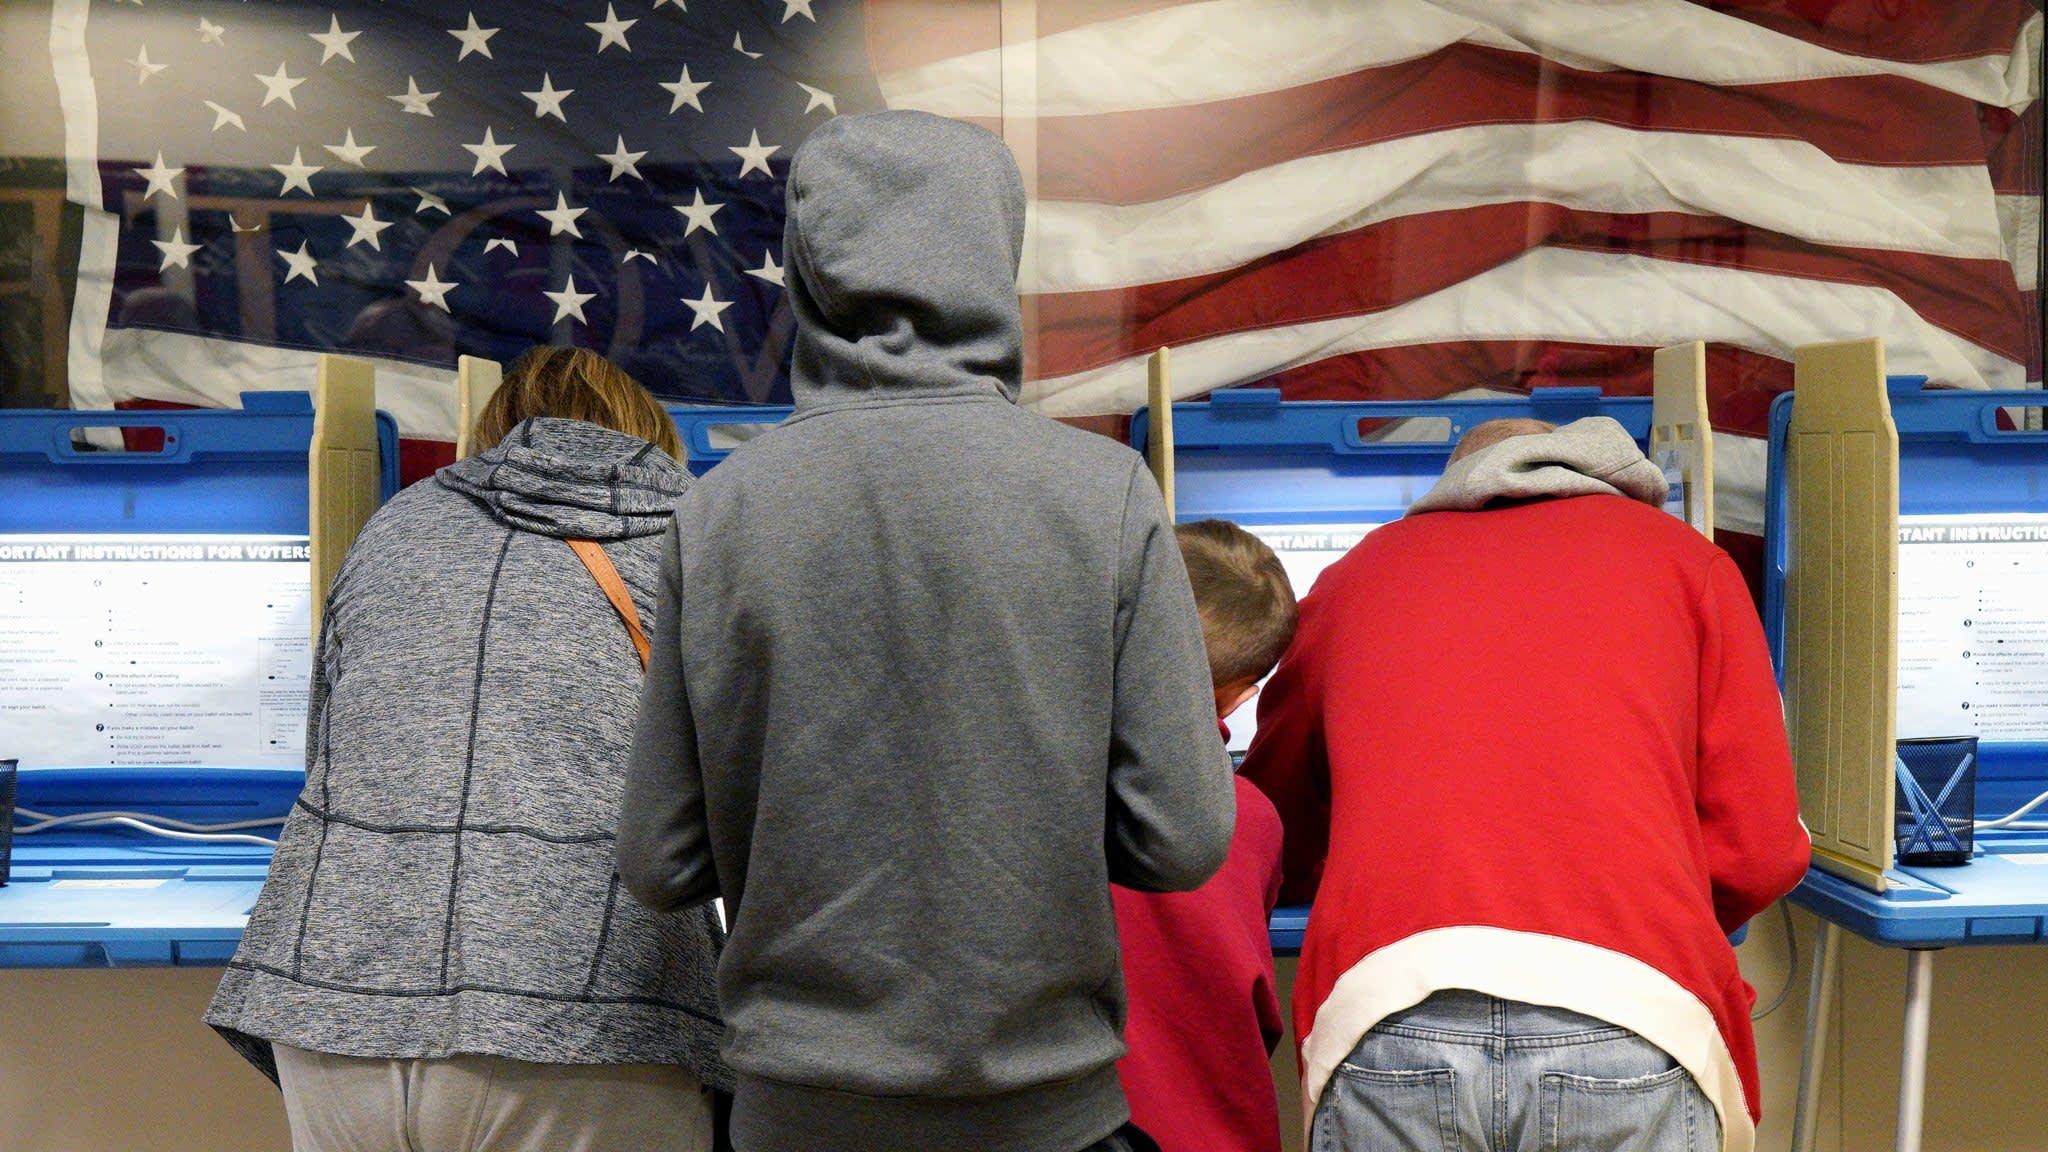 US stocks leap as midterms spring few surprises